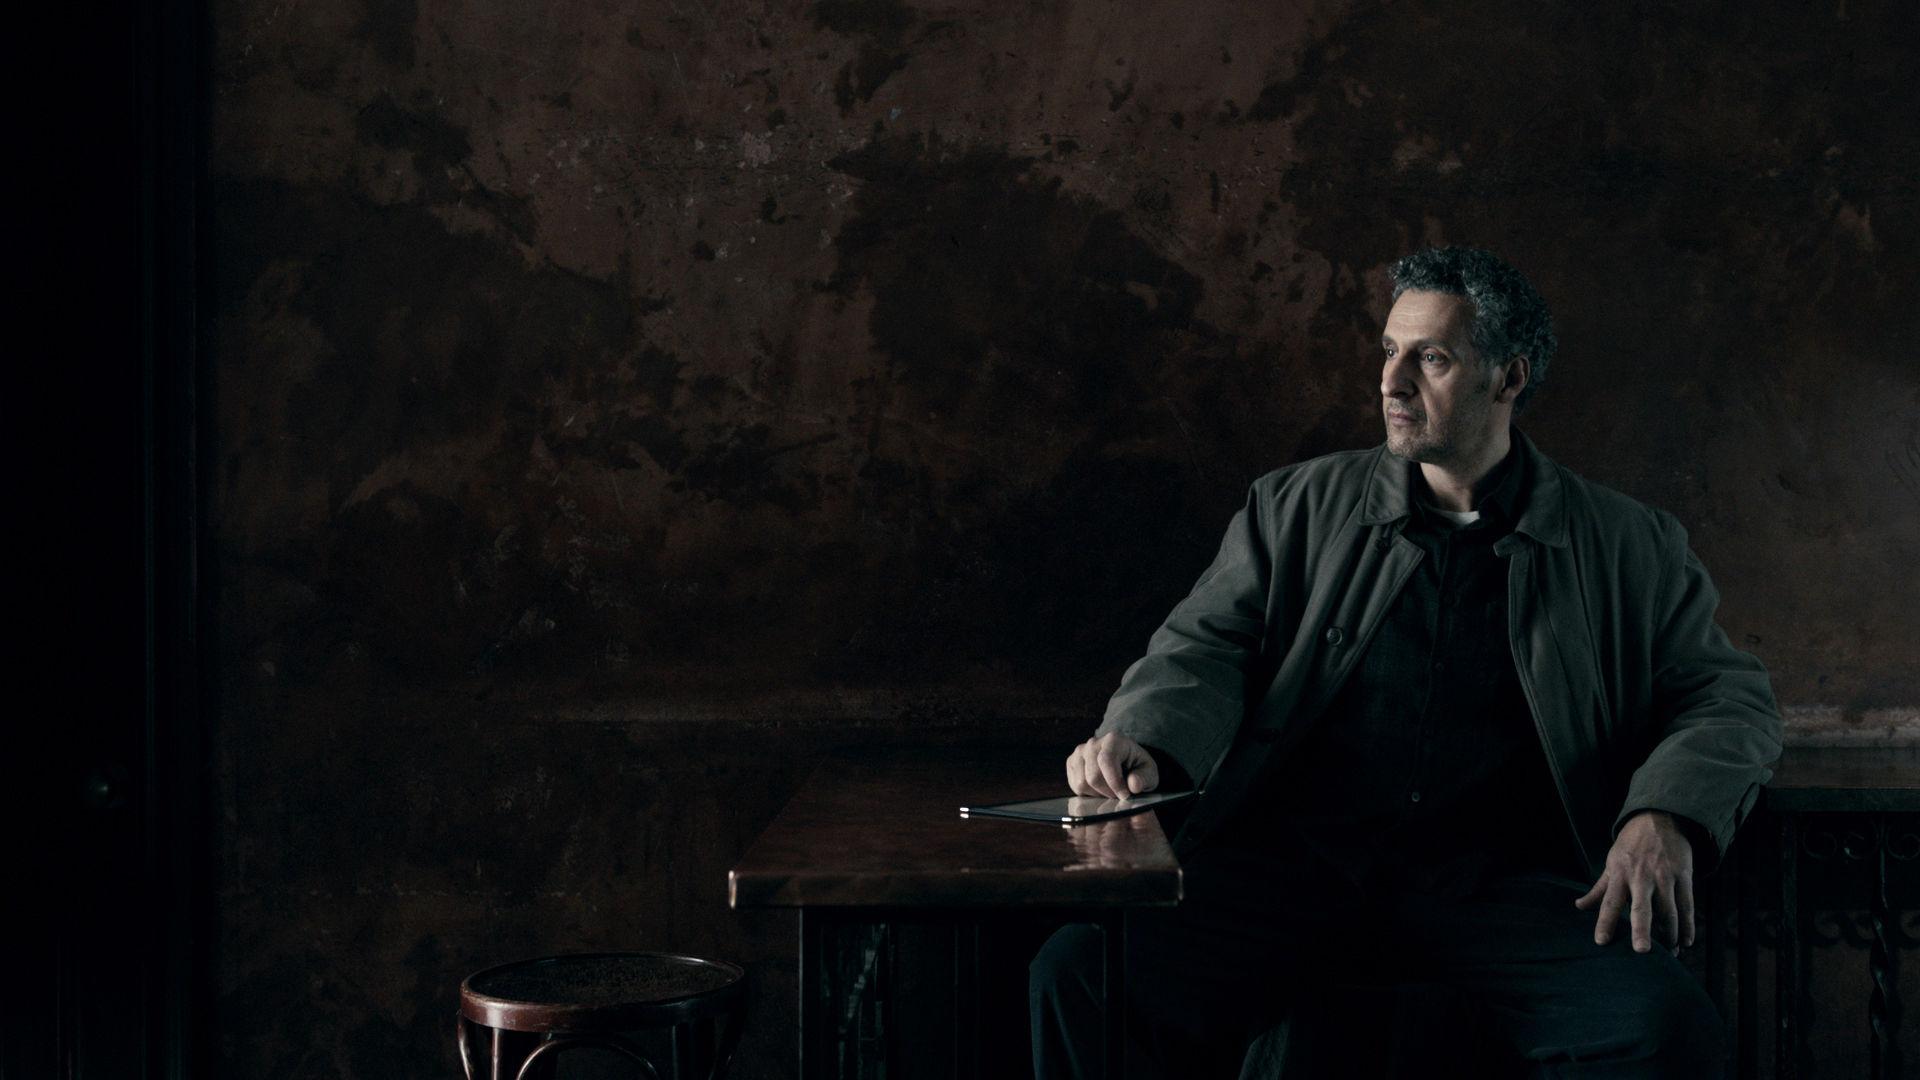 http://www.blackfilm.com/read/wp-content/uploads/2016/06/The-Night-Of-John-Turturro.jpg